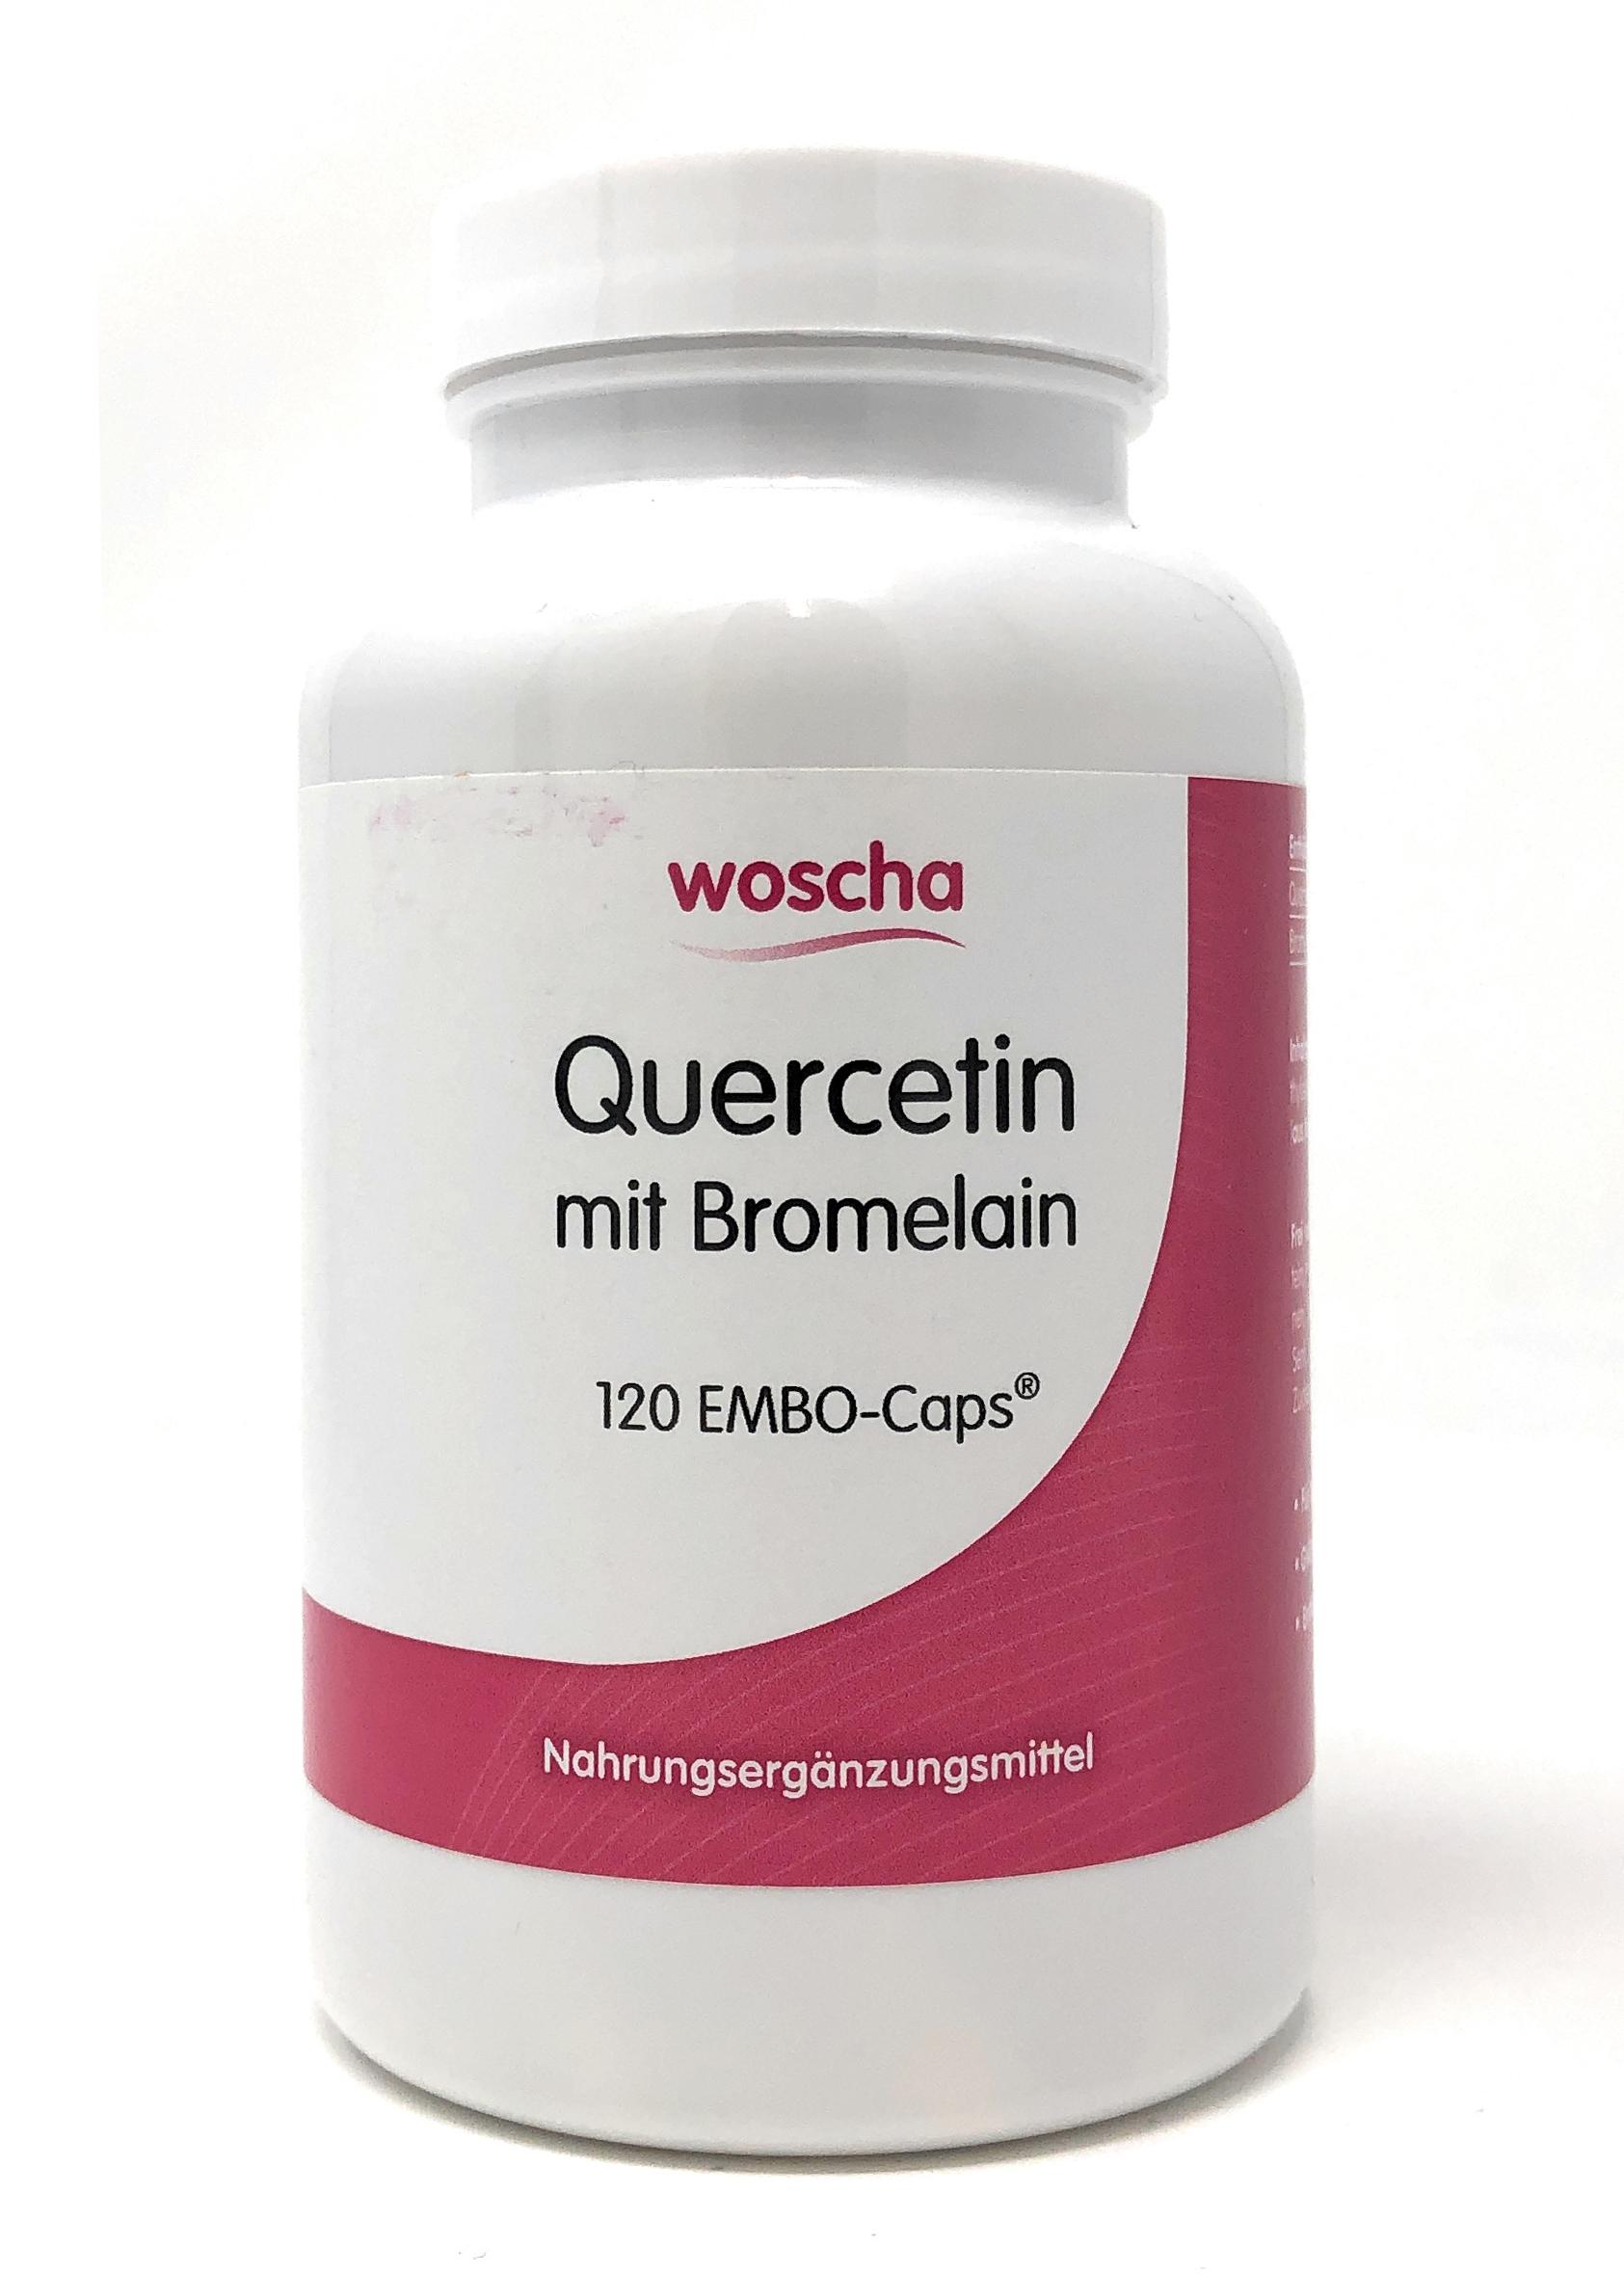 woscha Quercetin mit Bromelain 120 Embo-Caps (74g)(vegan)